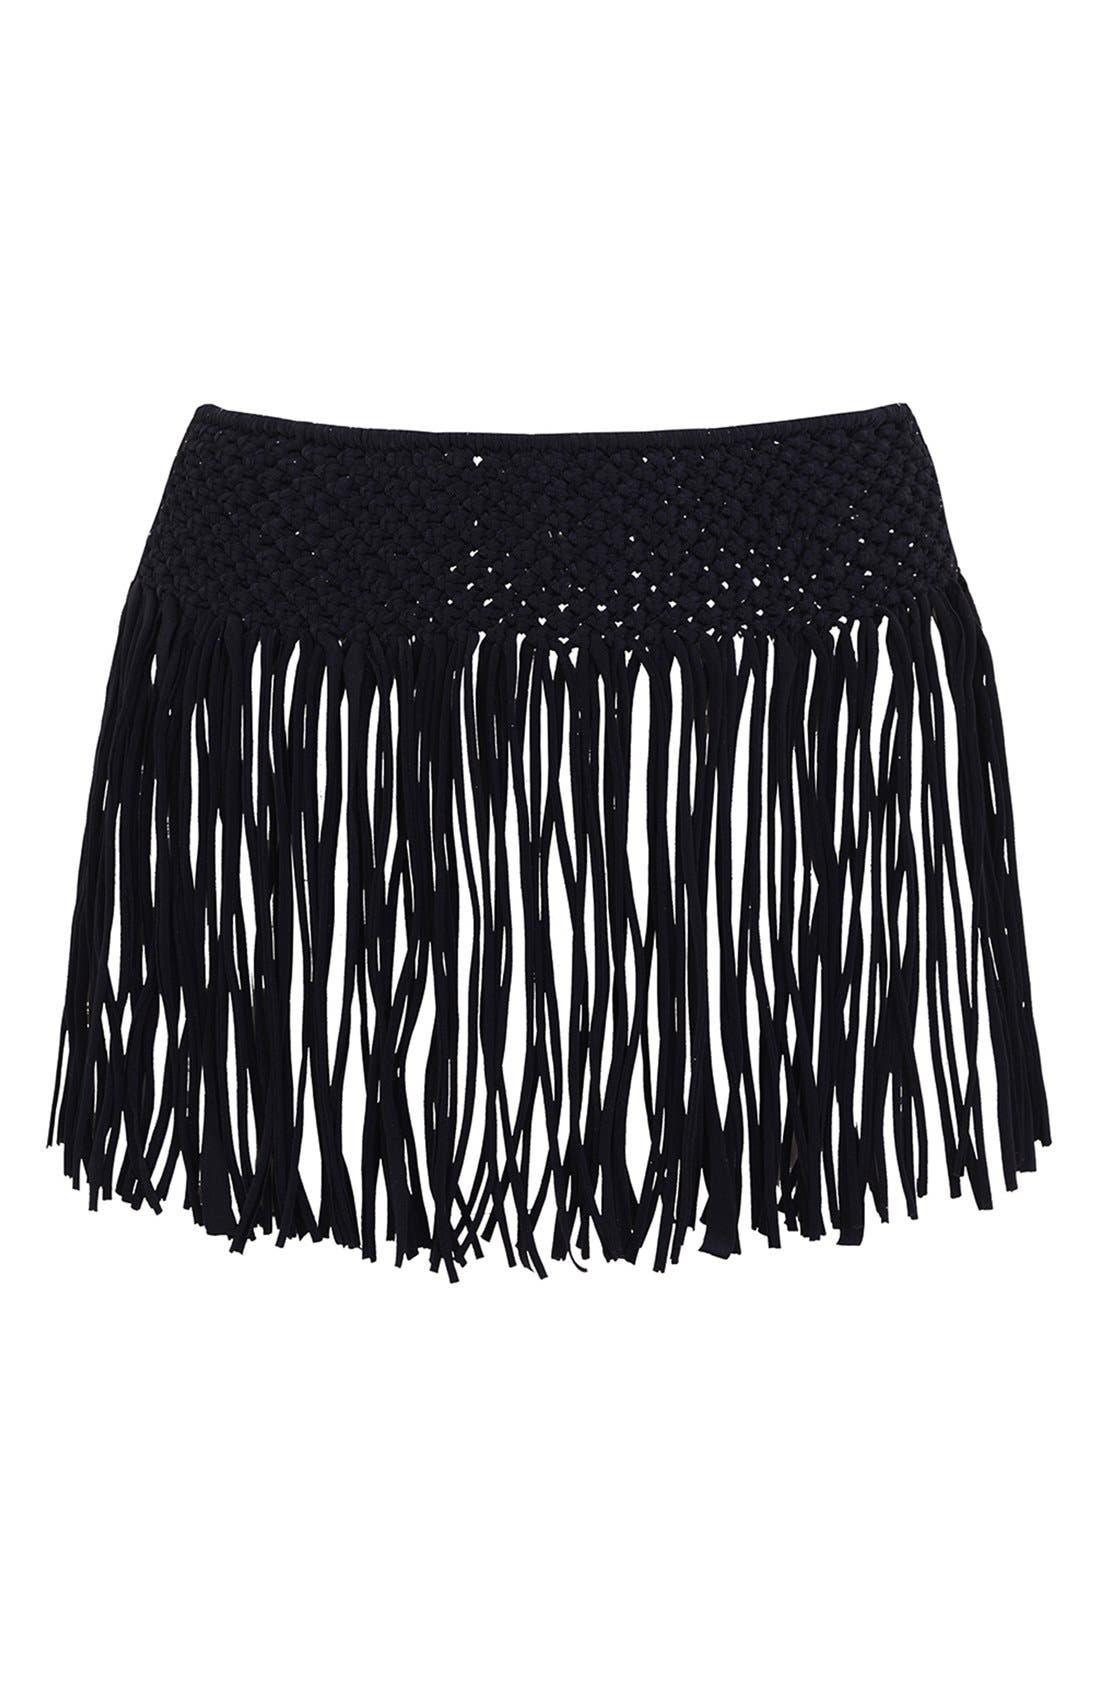 Alternate Image 1 Selected - KENDALL + KYLIE at Topshop Macramé Fringe Cover-Up Skirt